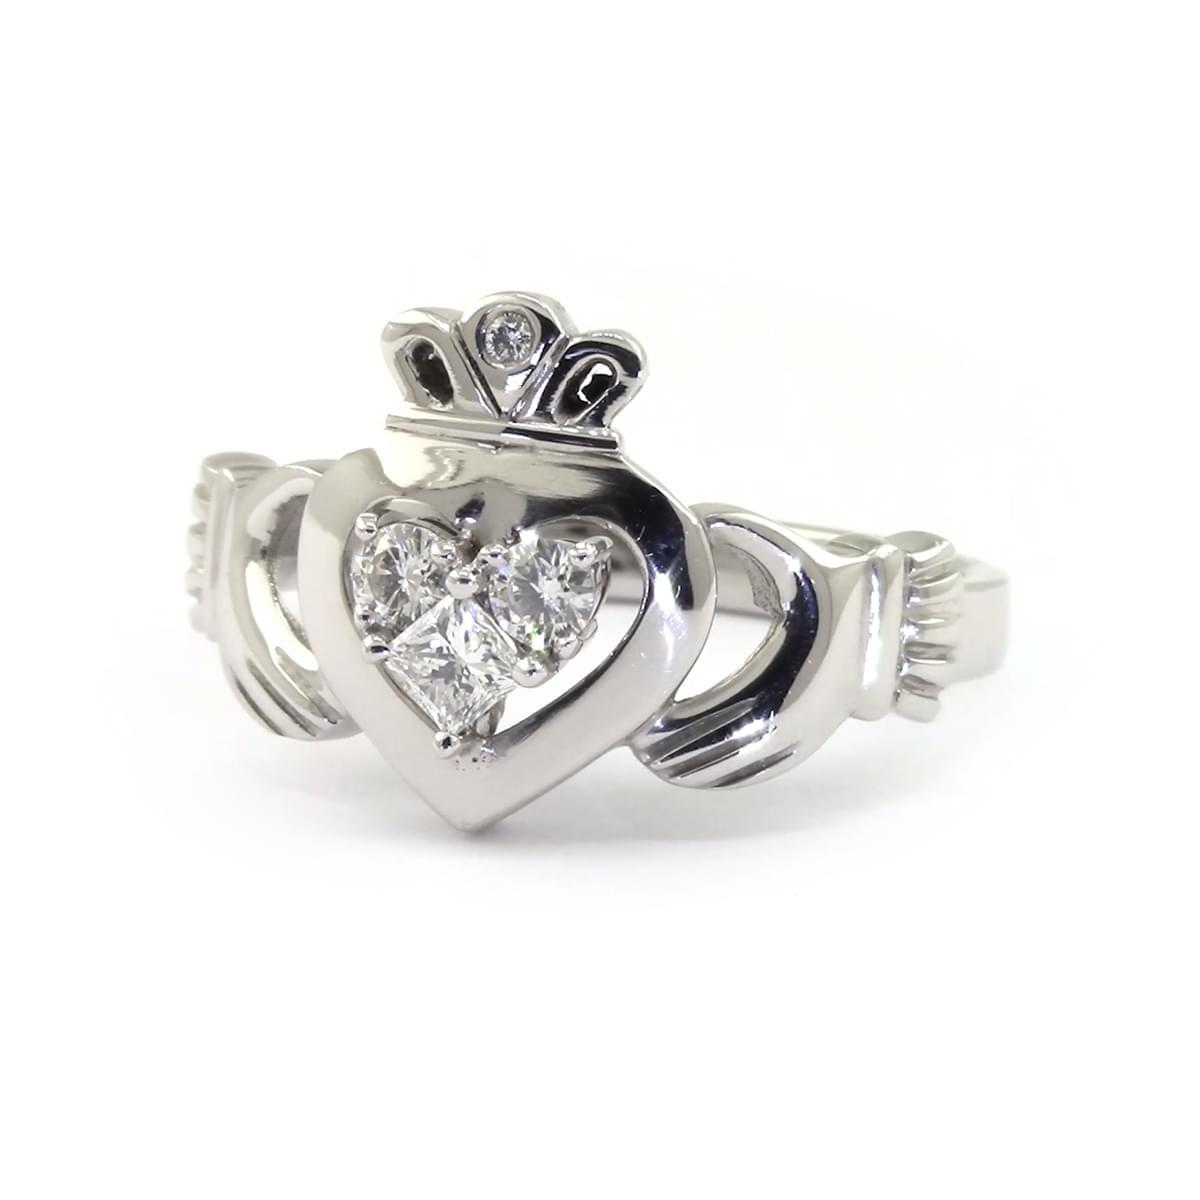 Claddagh Ring With Princess Cut Diamonds